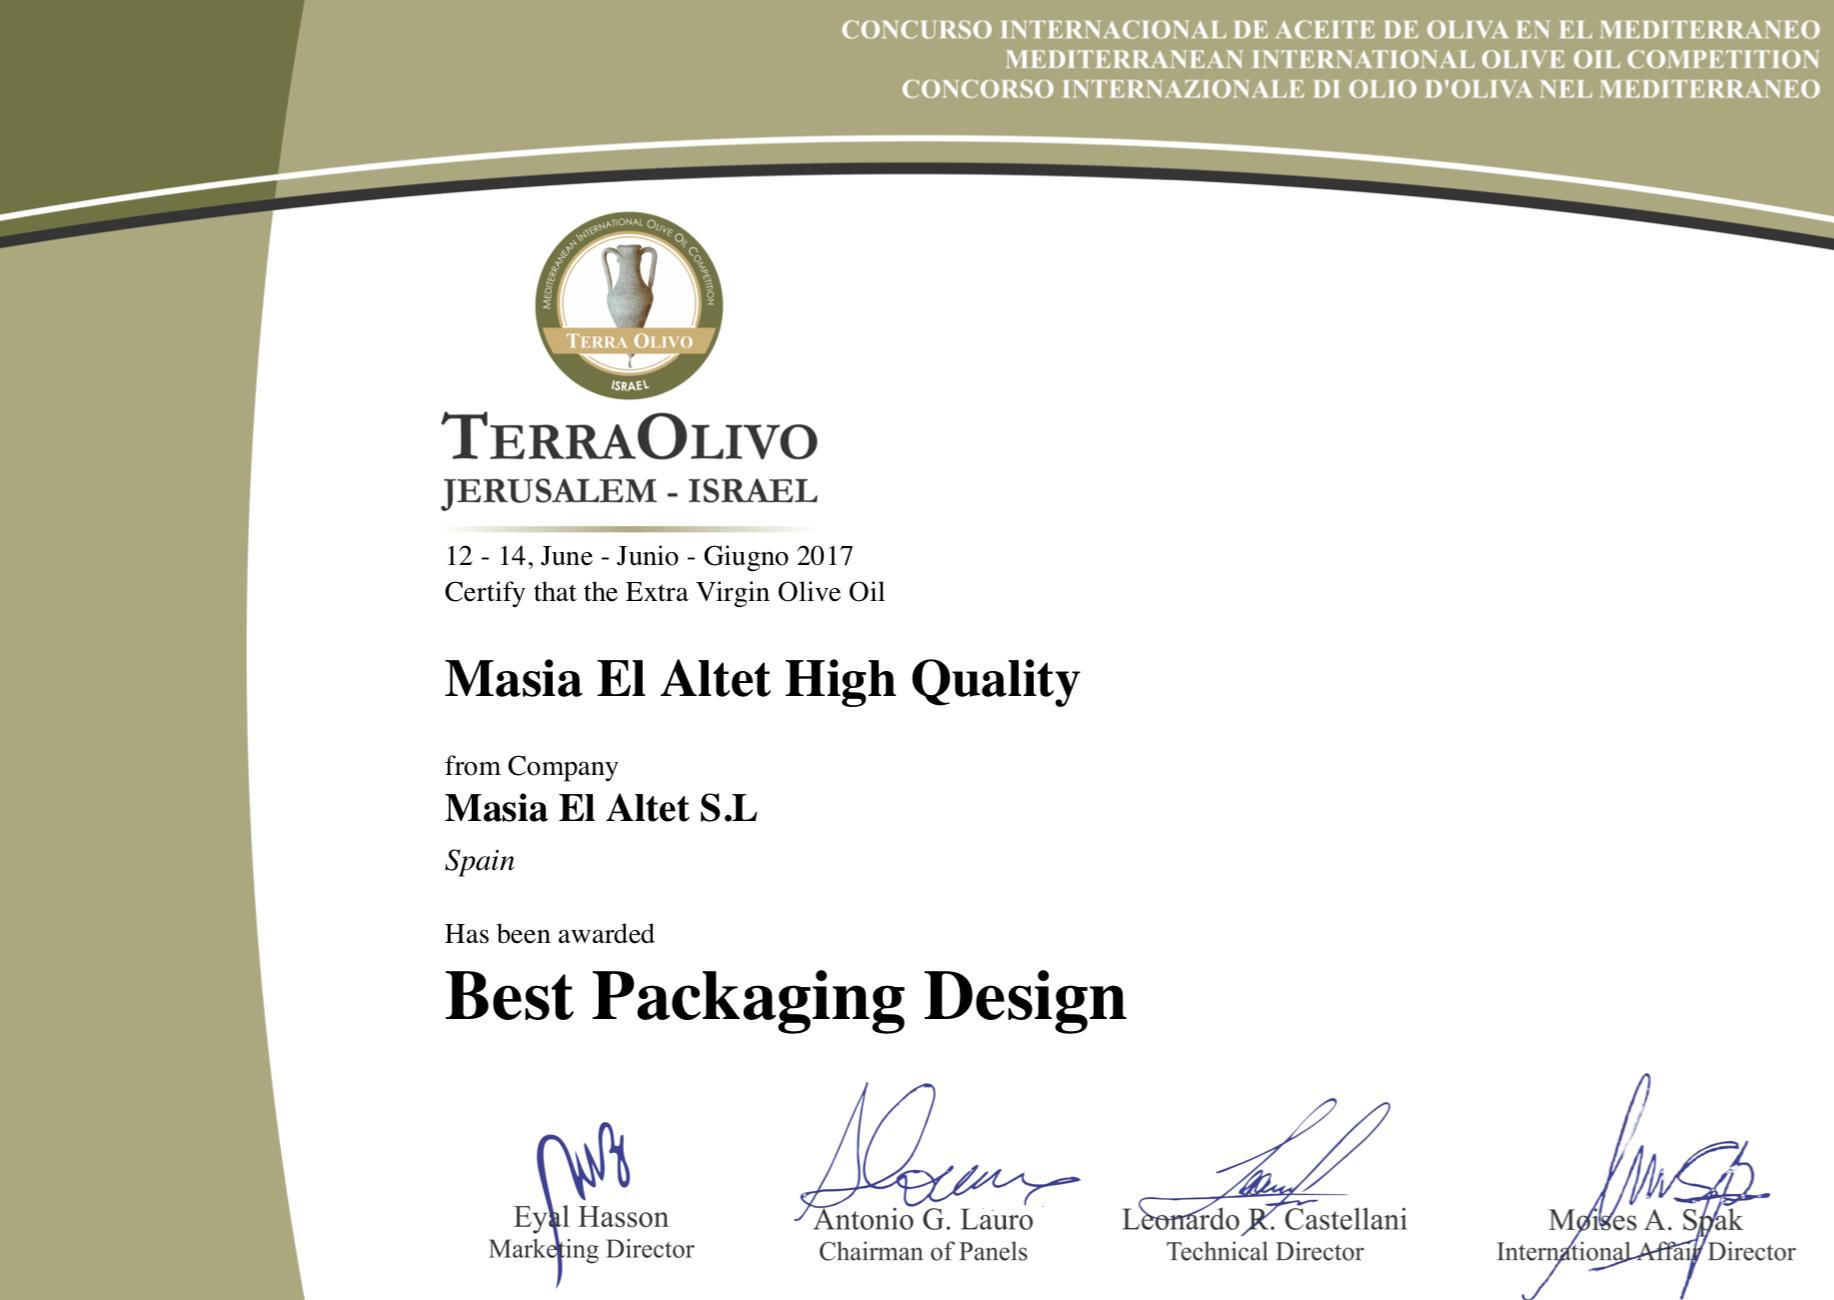 Premio Diseño TERRAOLIVO